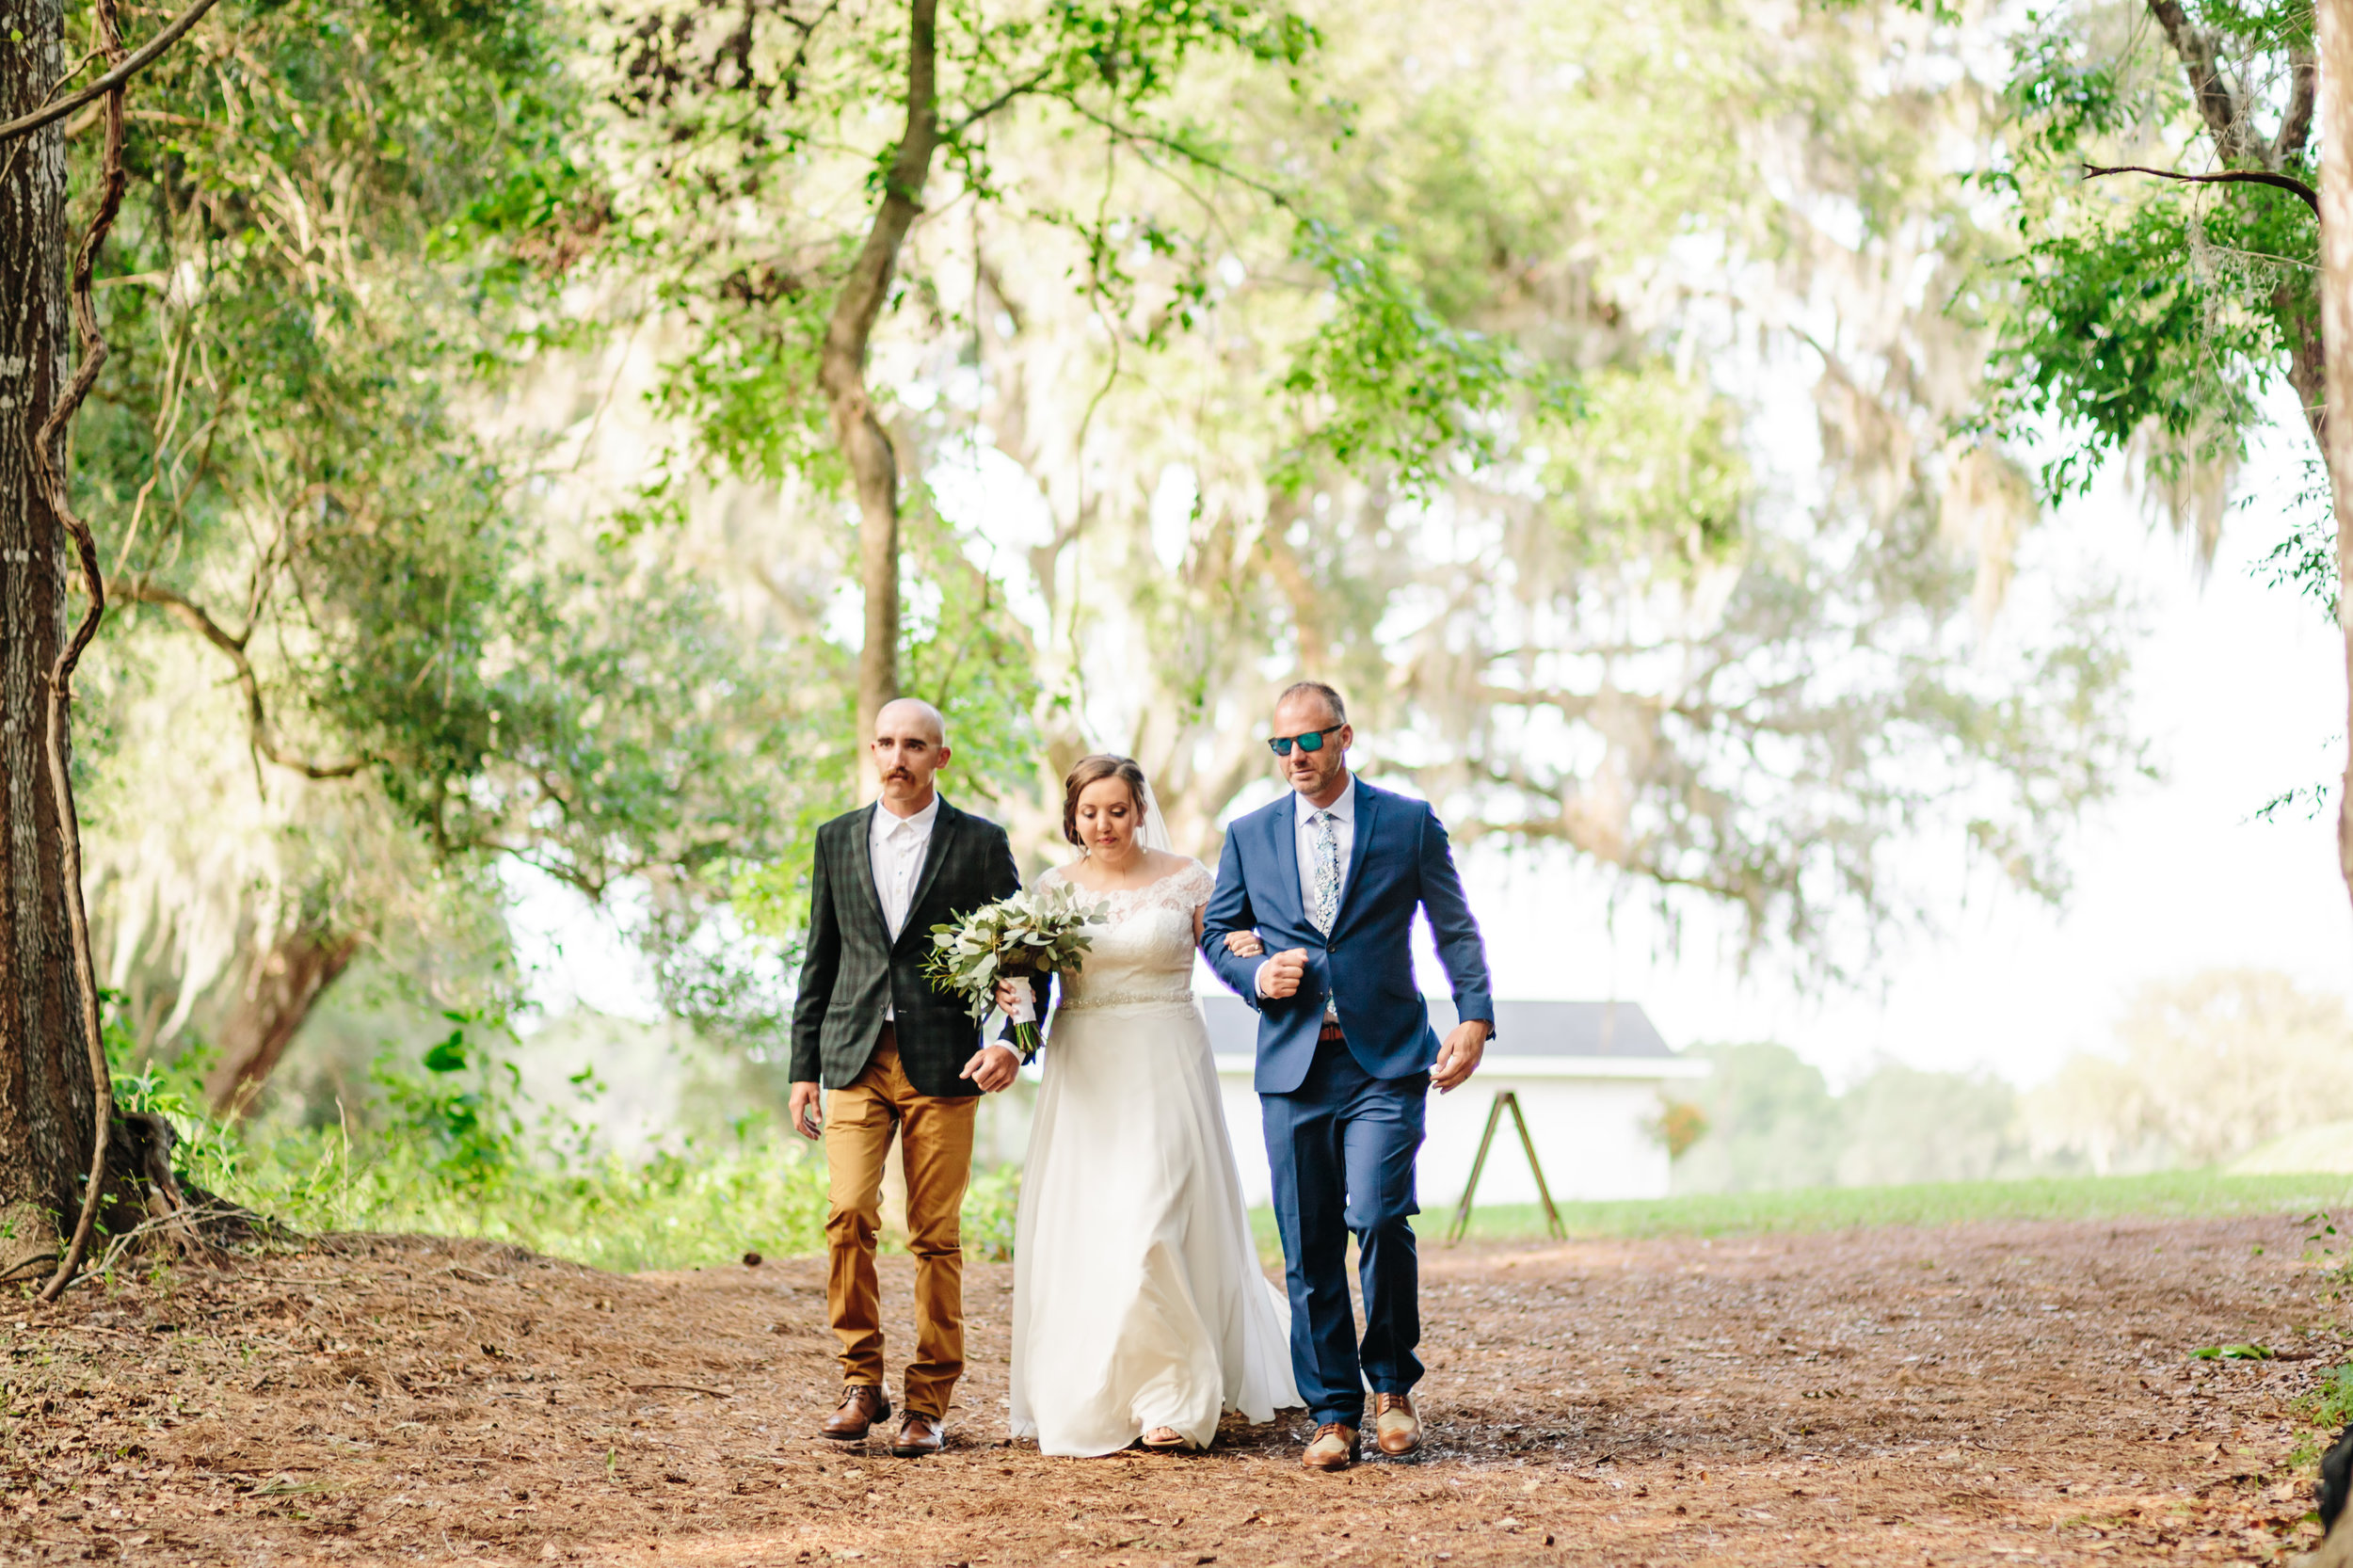 Griffin Wedding October Oaks Farm-305.jpg